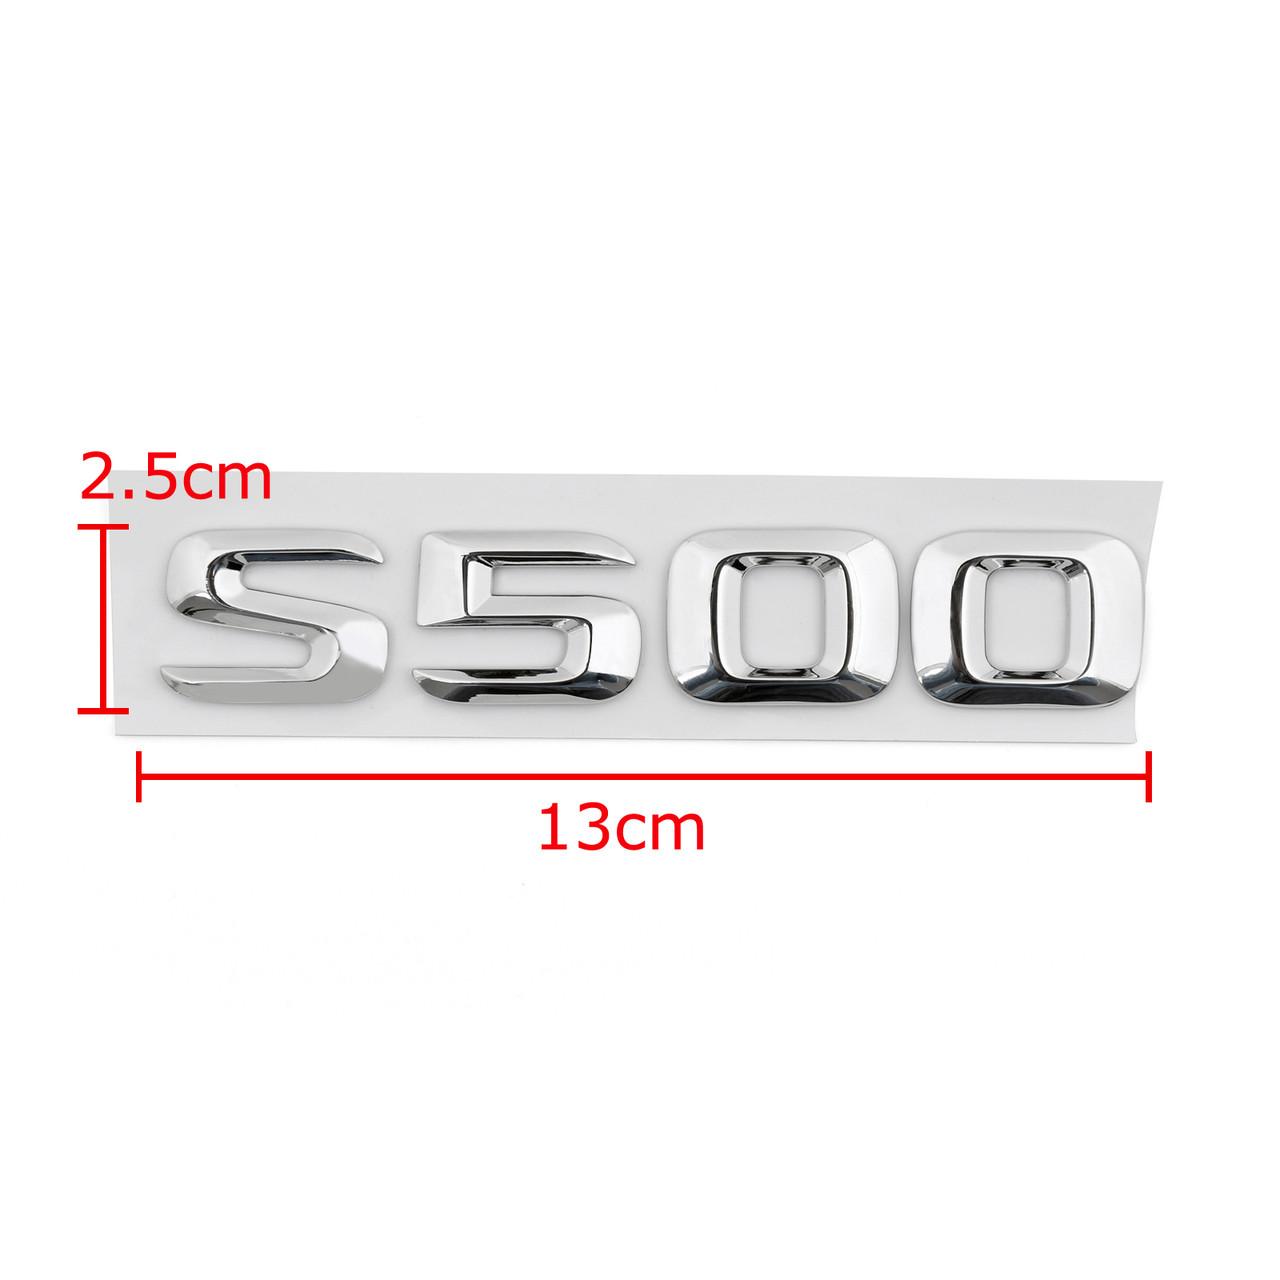 S500 Letter Trunk Emblem Rear Badge Decal Sticker for Mercedes Benz S 500